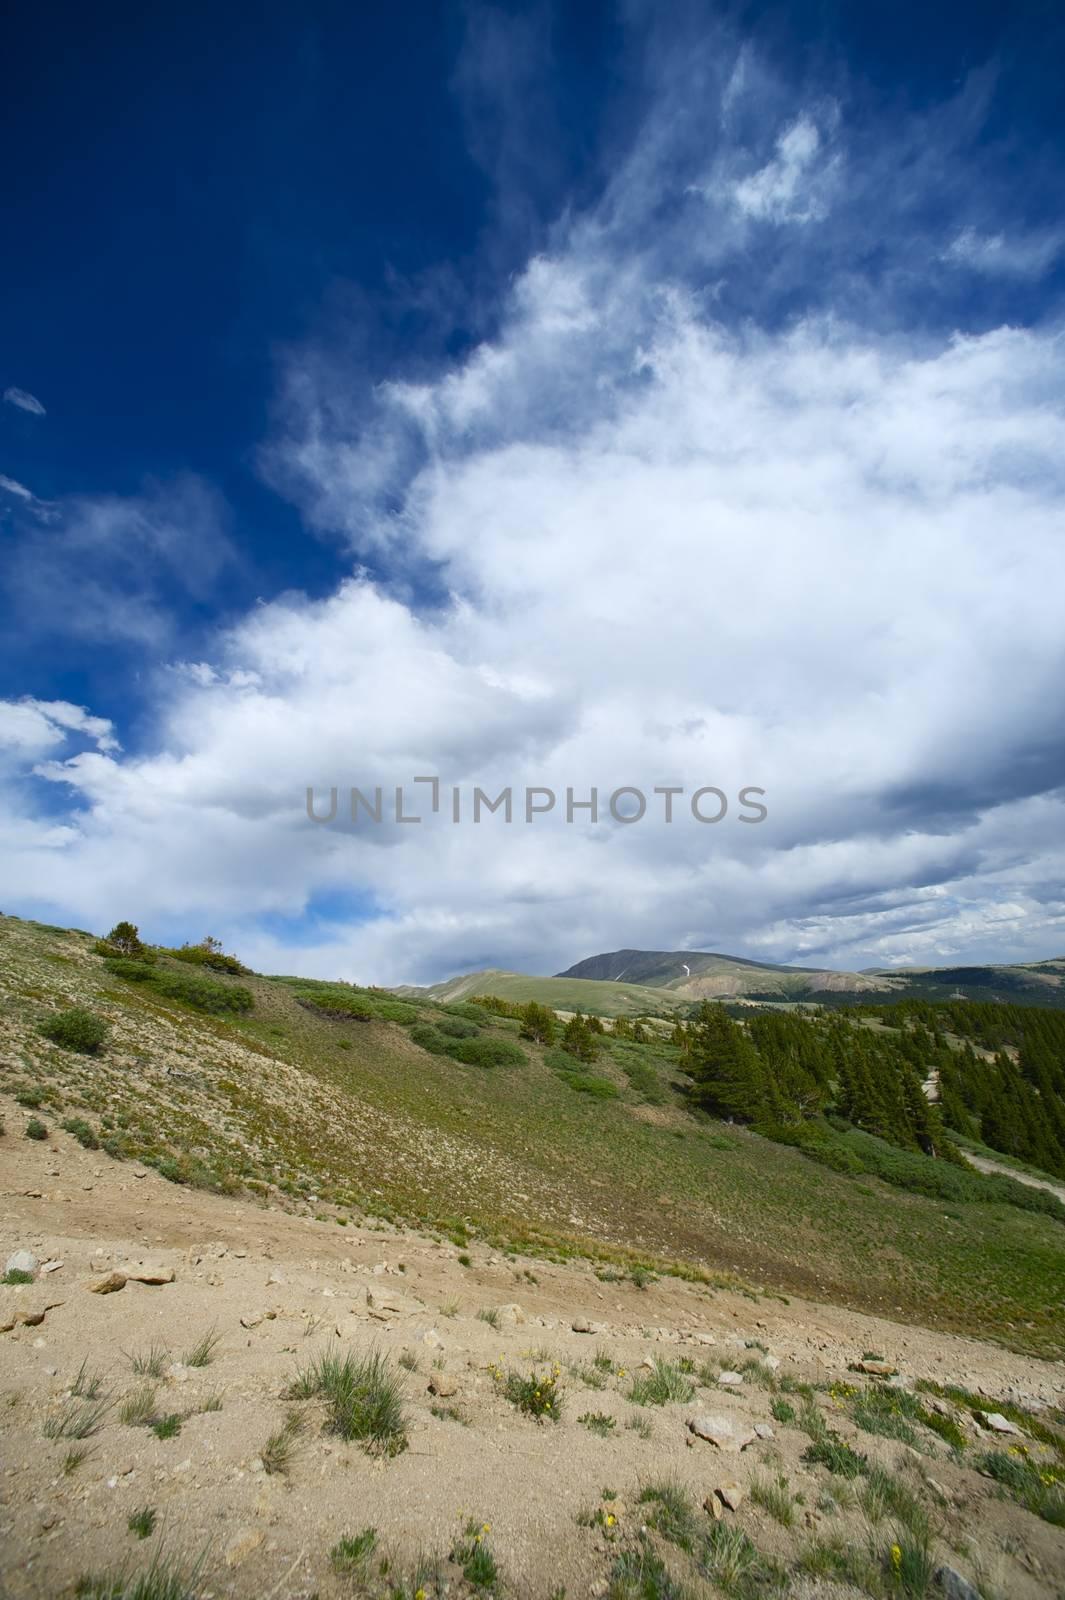 Summer Rockies. Rocky Mountains neat Alma City, Colorado USA. Portrait Alignment.